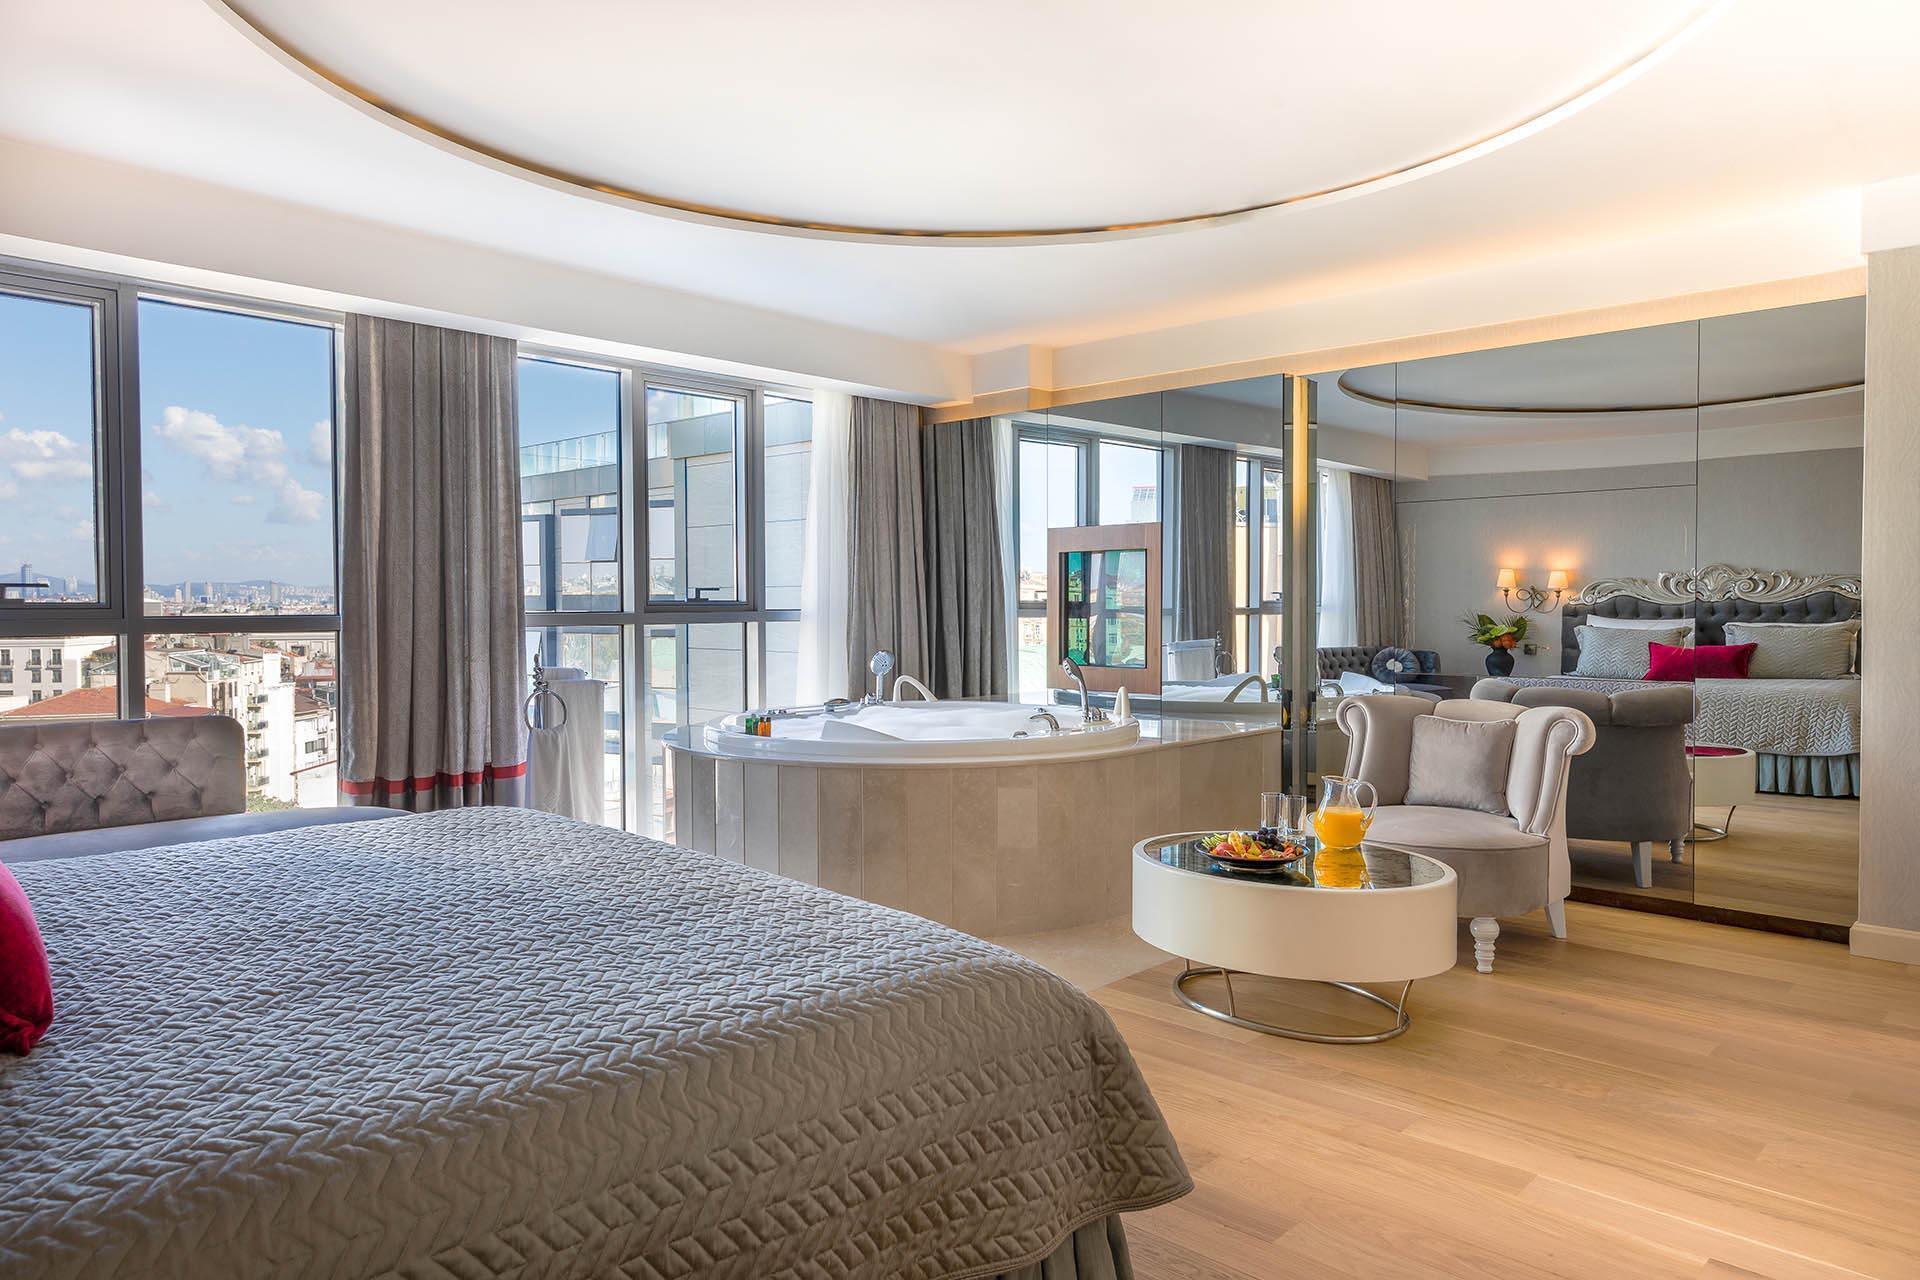 Luxury Suite at CVK Taksim Hotel in Istanbul